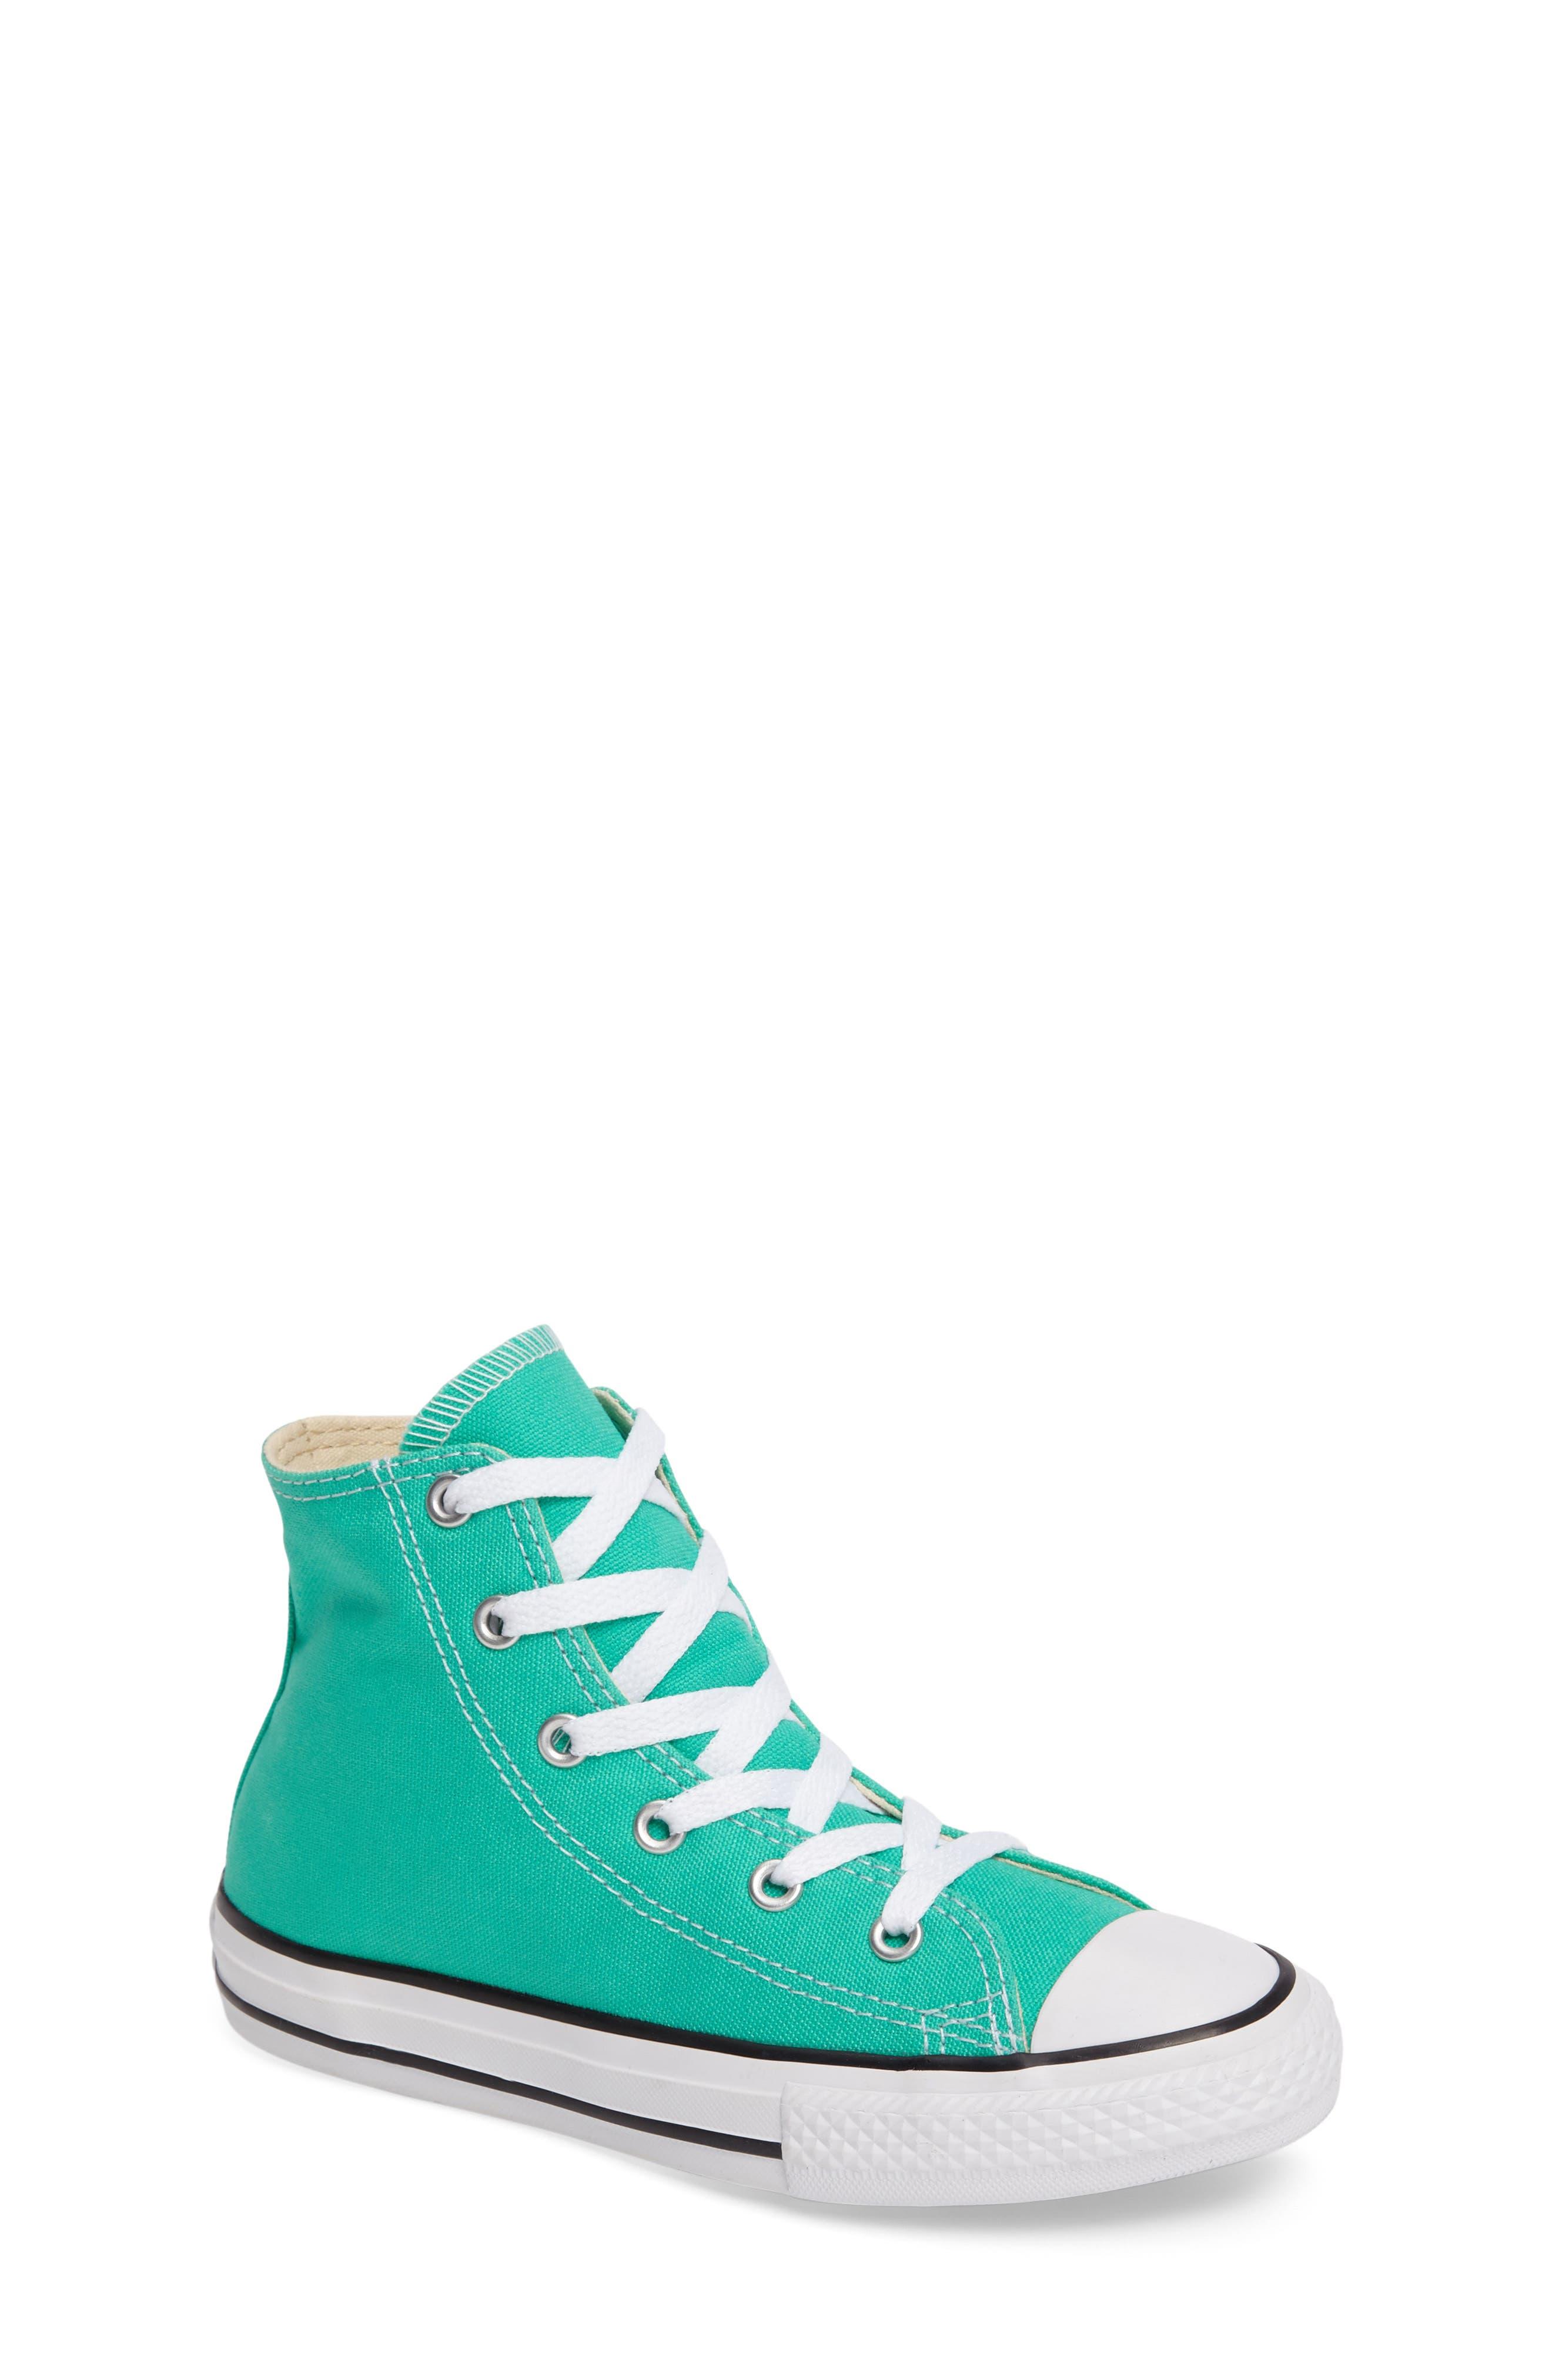 Converse Chuck Taylor® All Star® Seasonal High Top Sneaker (Baby, Walker, Toddler & Little Kid)